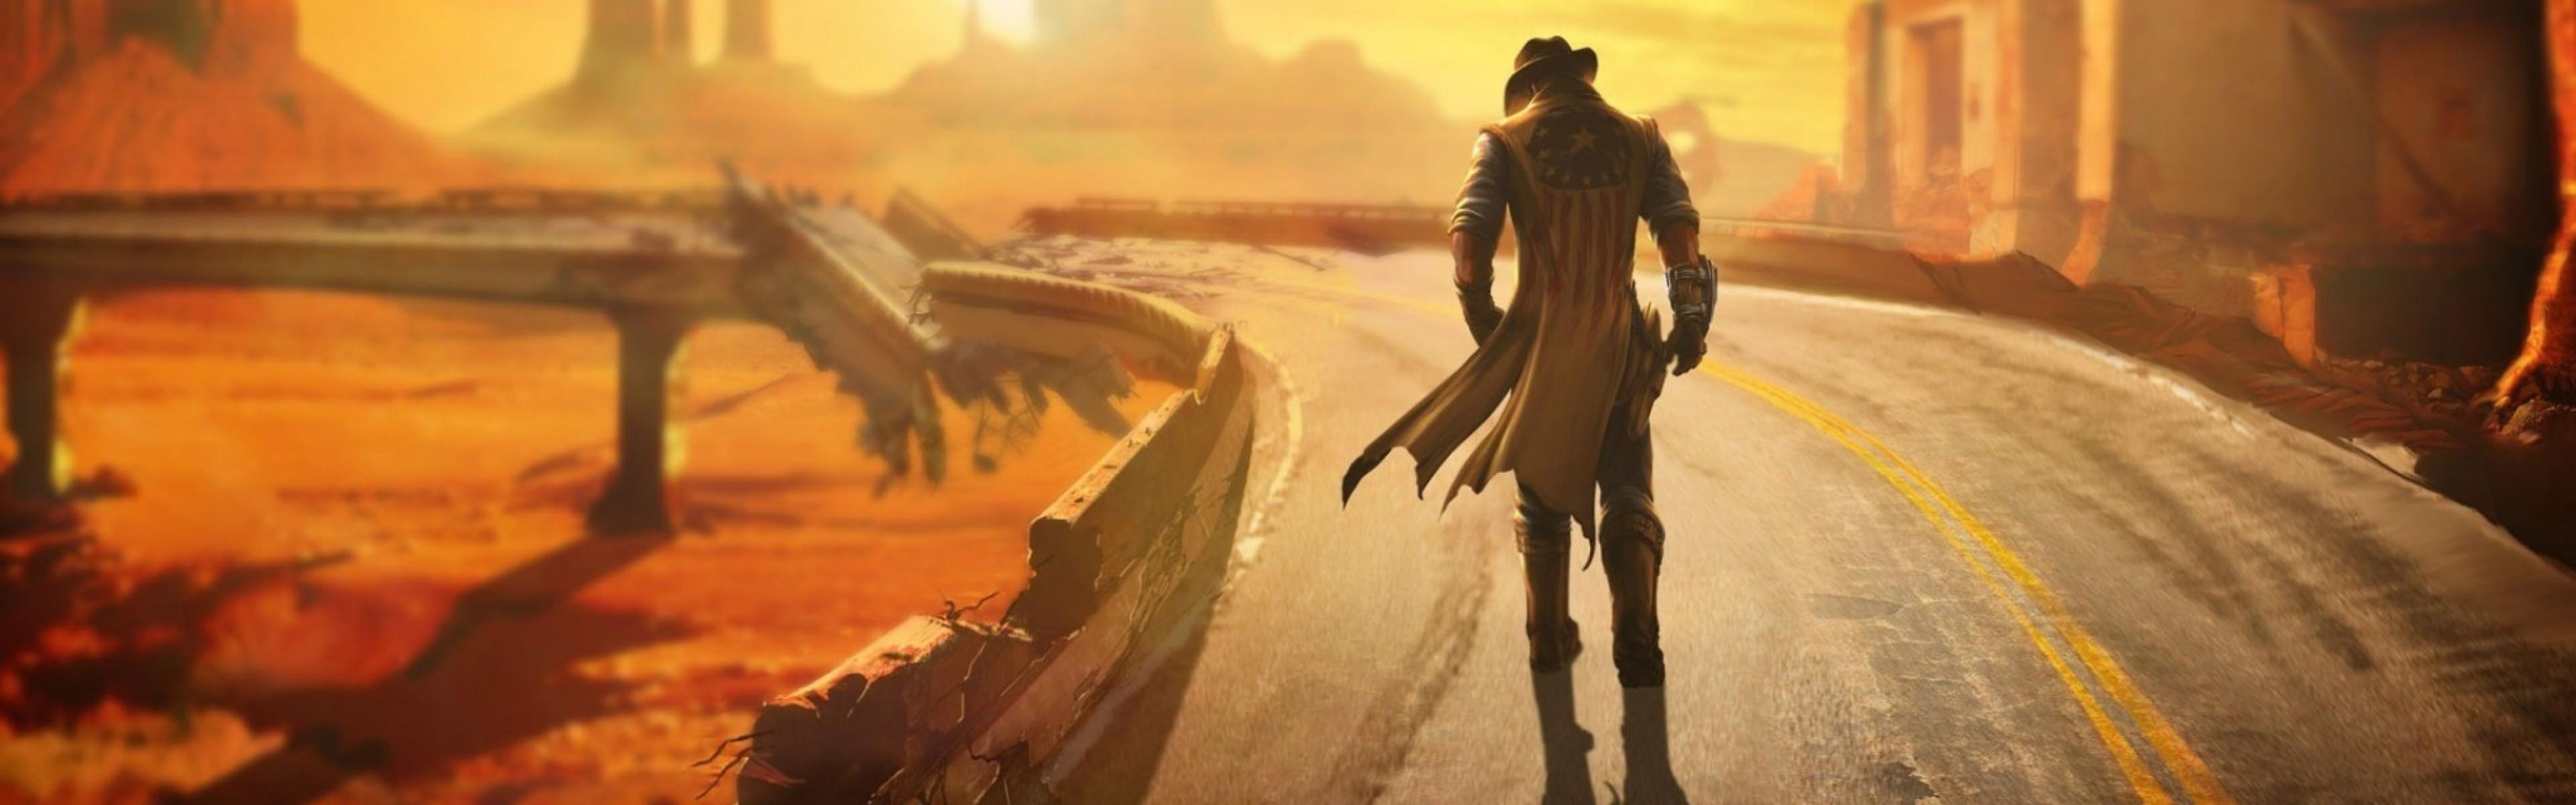 Wallpaper fallout, new vegas, wasteland, loner, road, hero